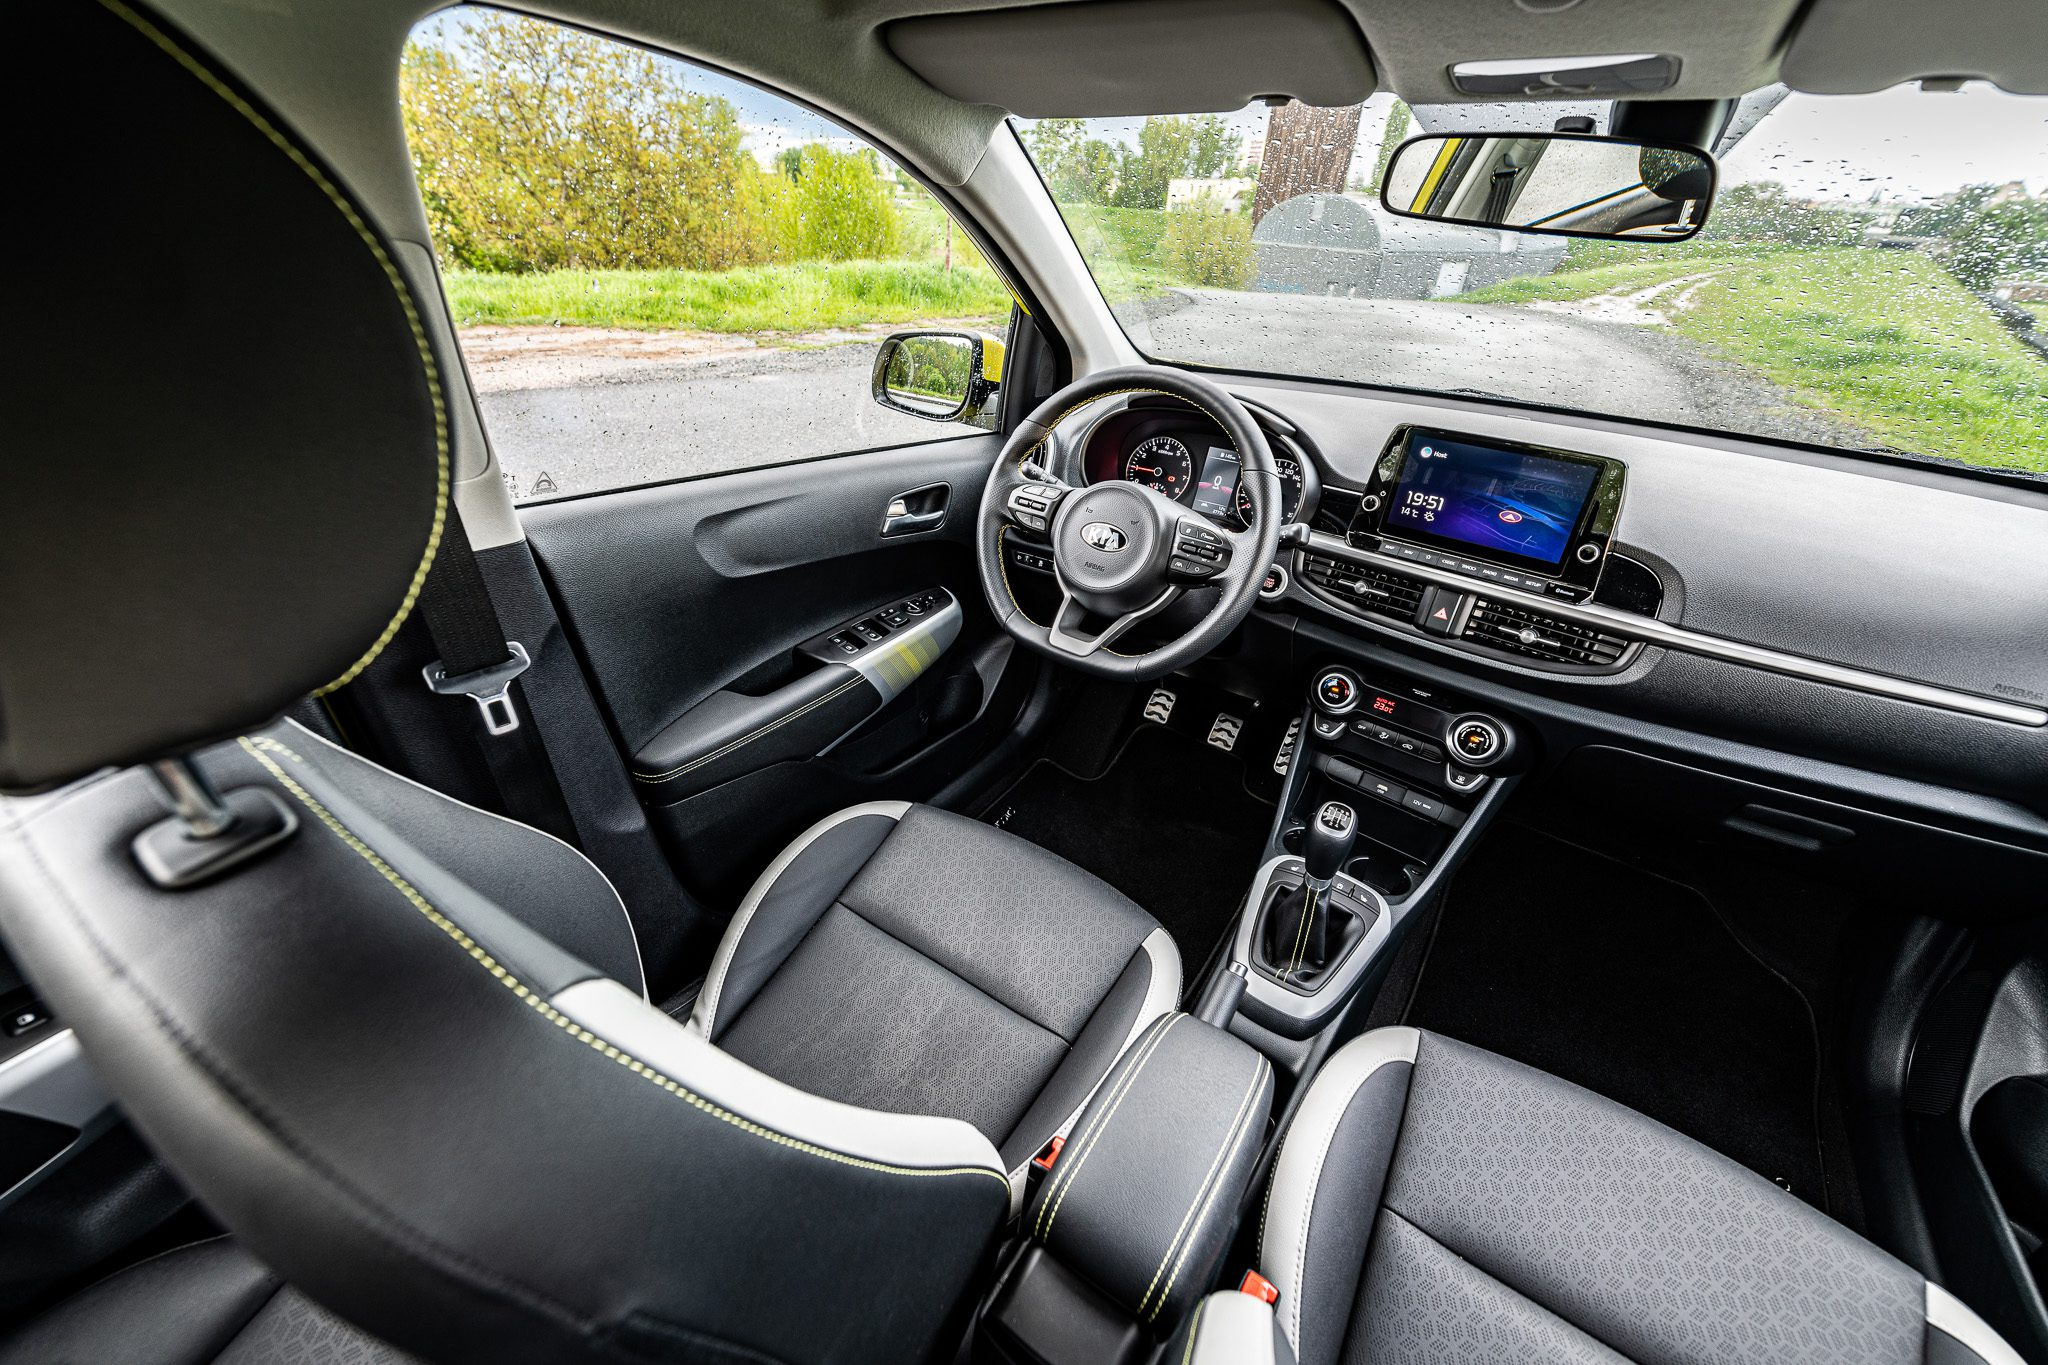 Kia Picanto interiér vozu plaubní deska sedadla